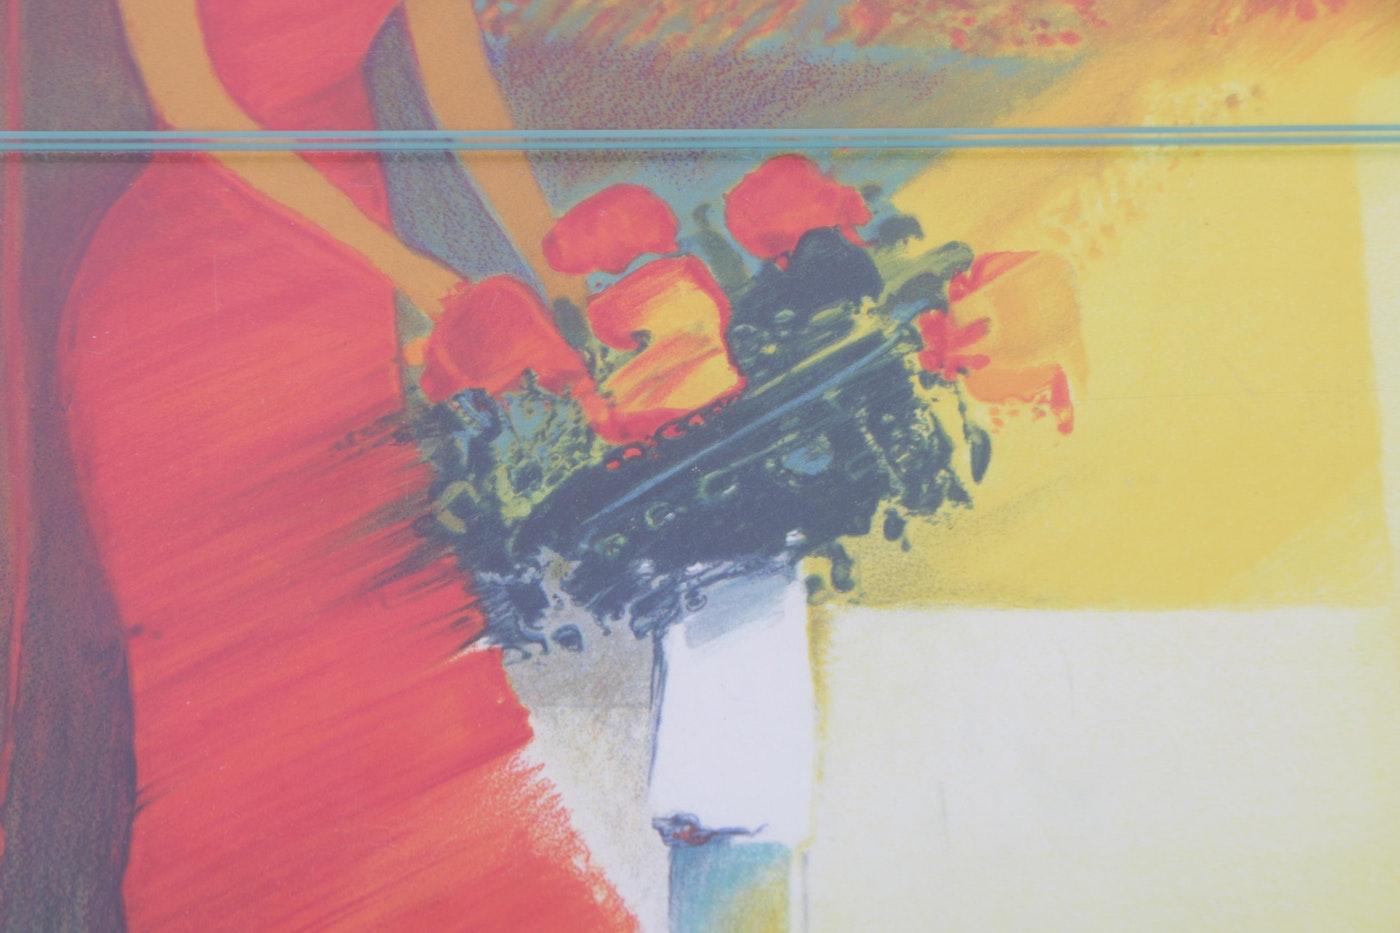 Emile bellet hors commerce color lithographs on paper ebth for Decoration interieur f2